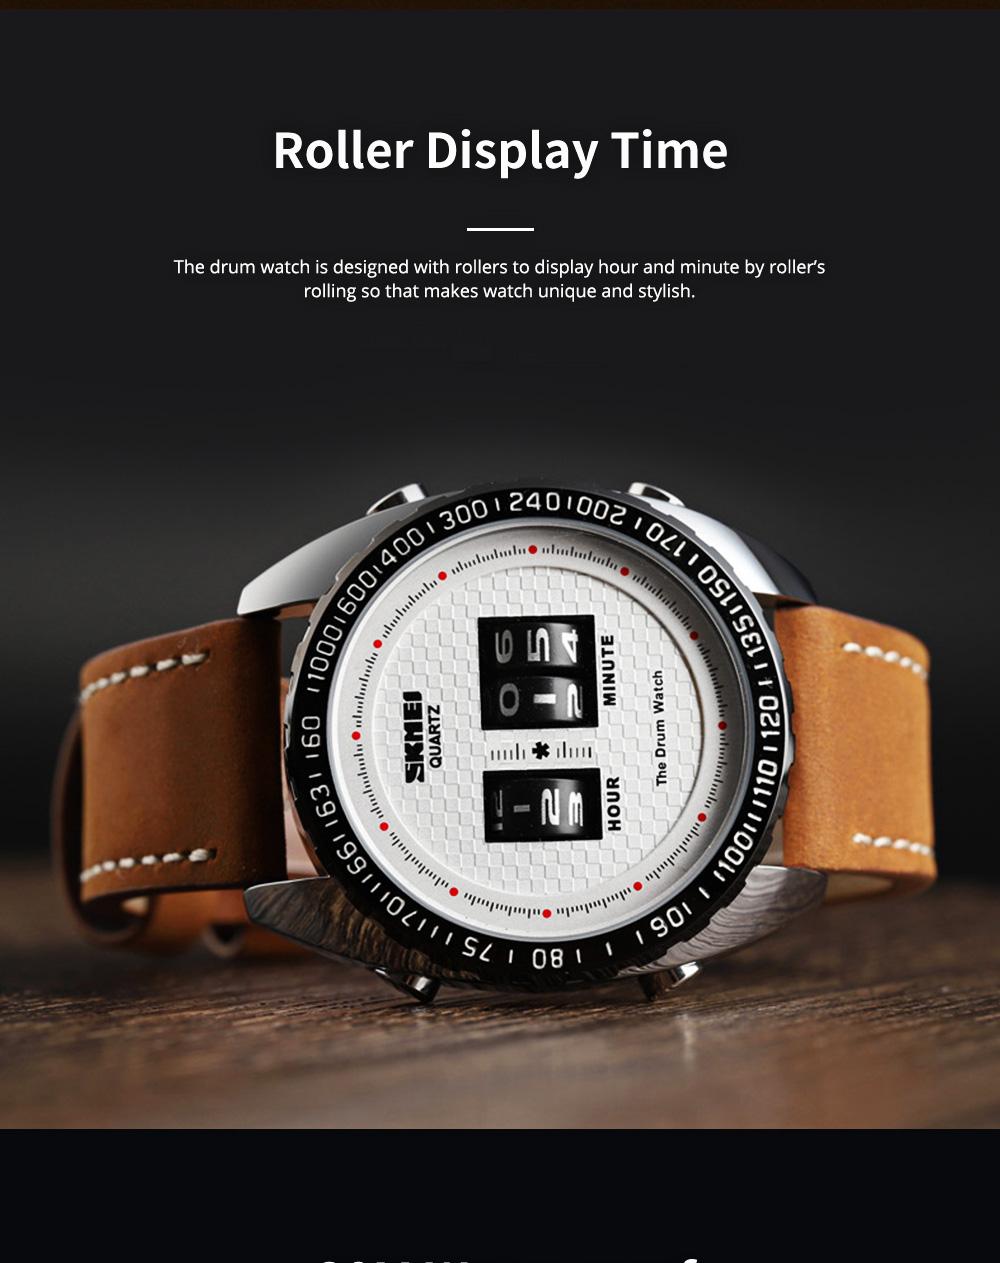 Fashionable Casual Men's Drum Watch with Genuine Leather Bracelet Waterproof Qualified Quartz Movement Wristwatch Round Dial Roller Wrist Watch 1